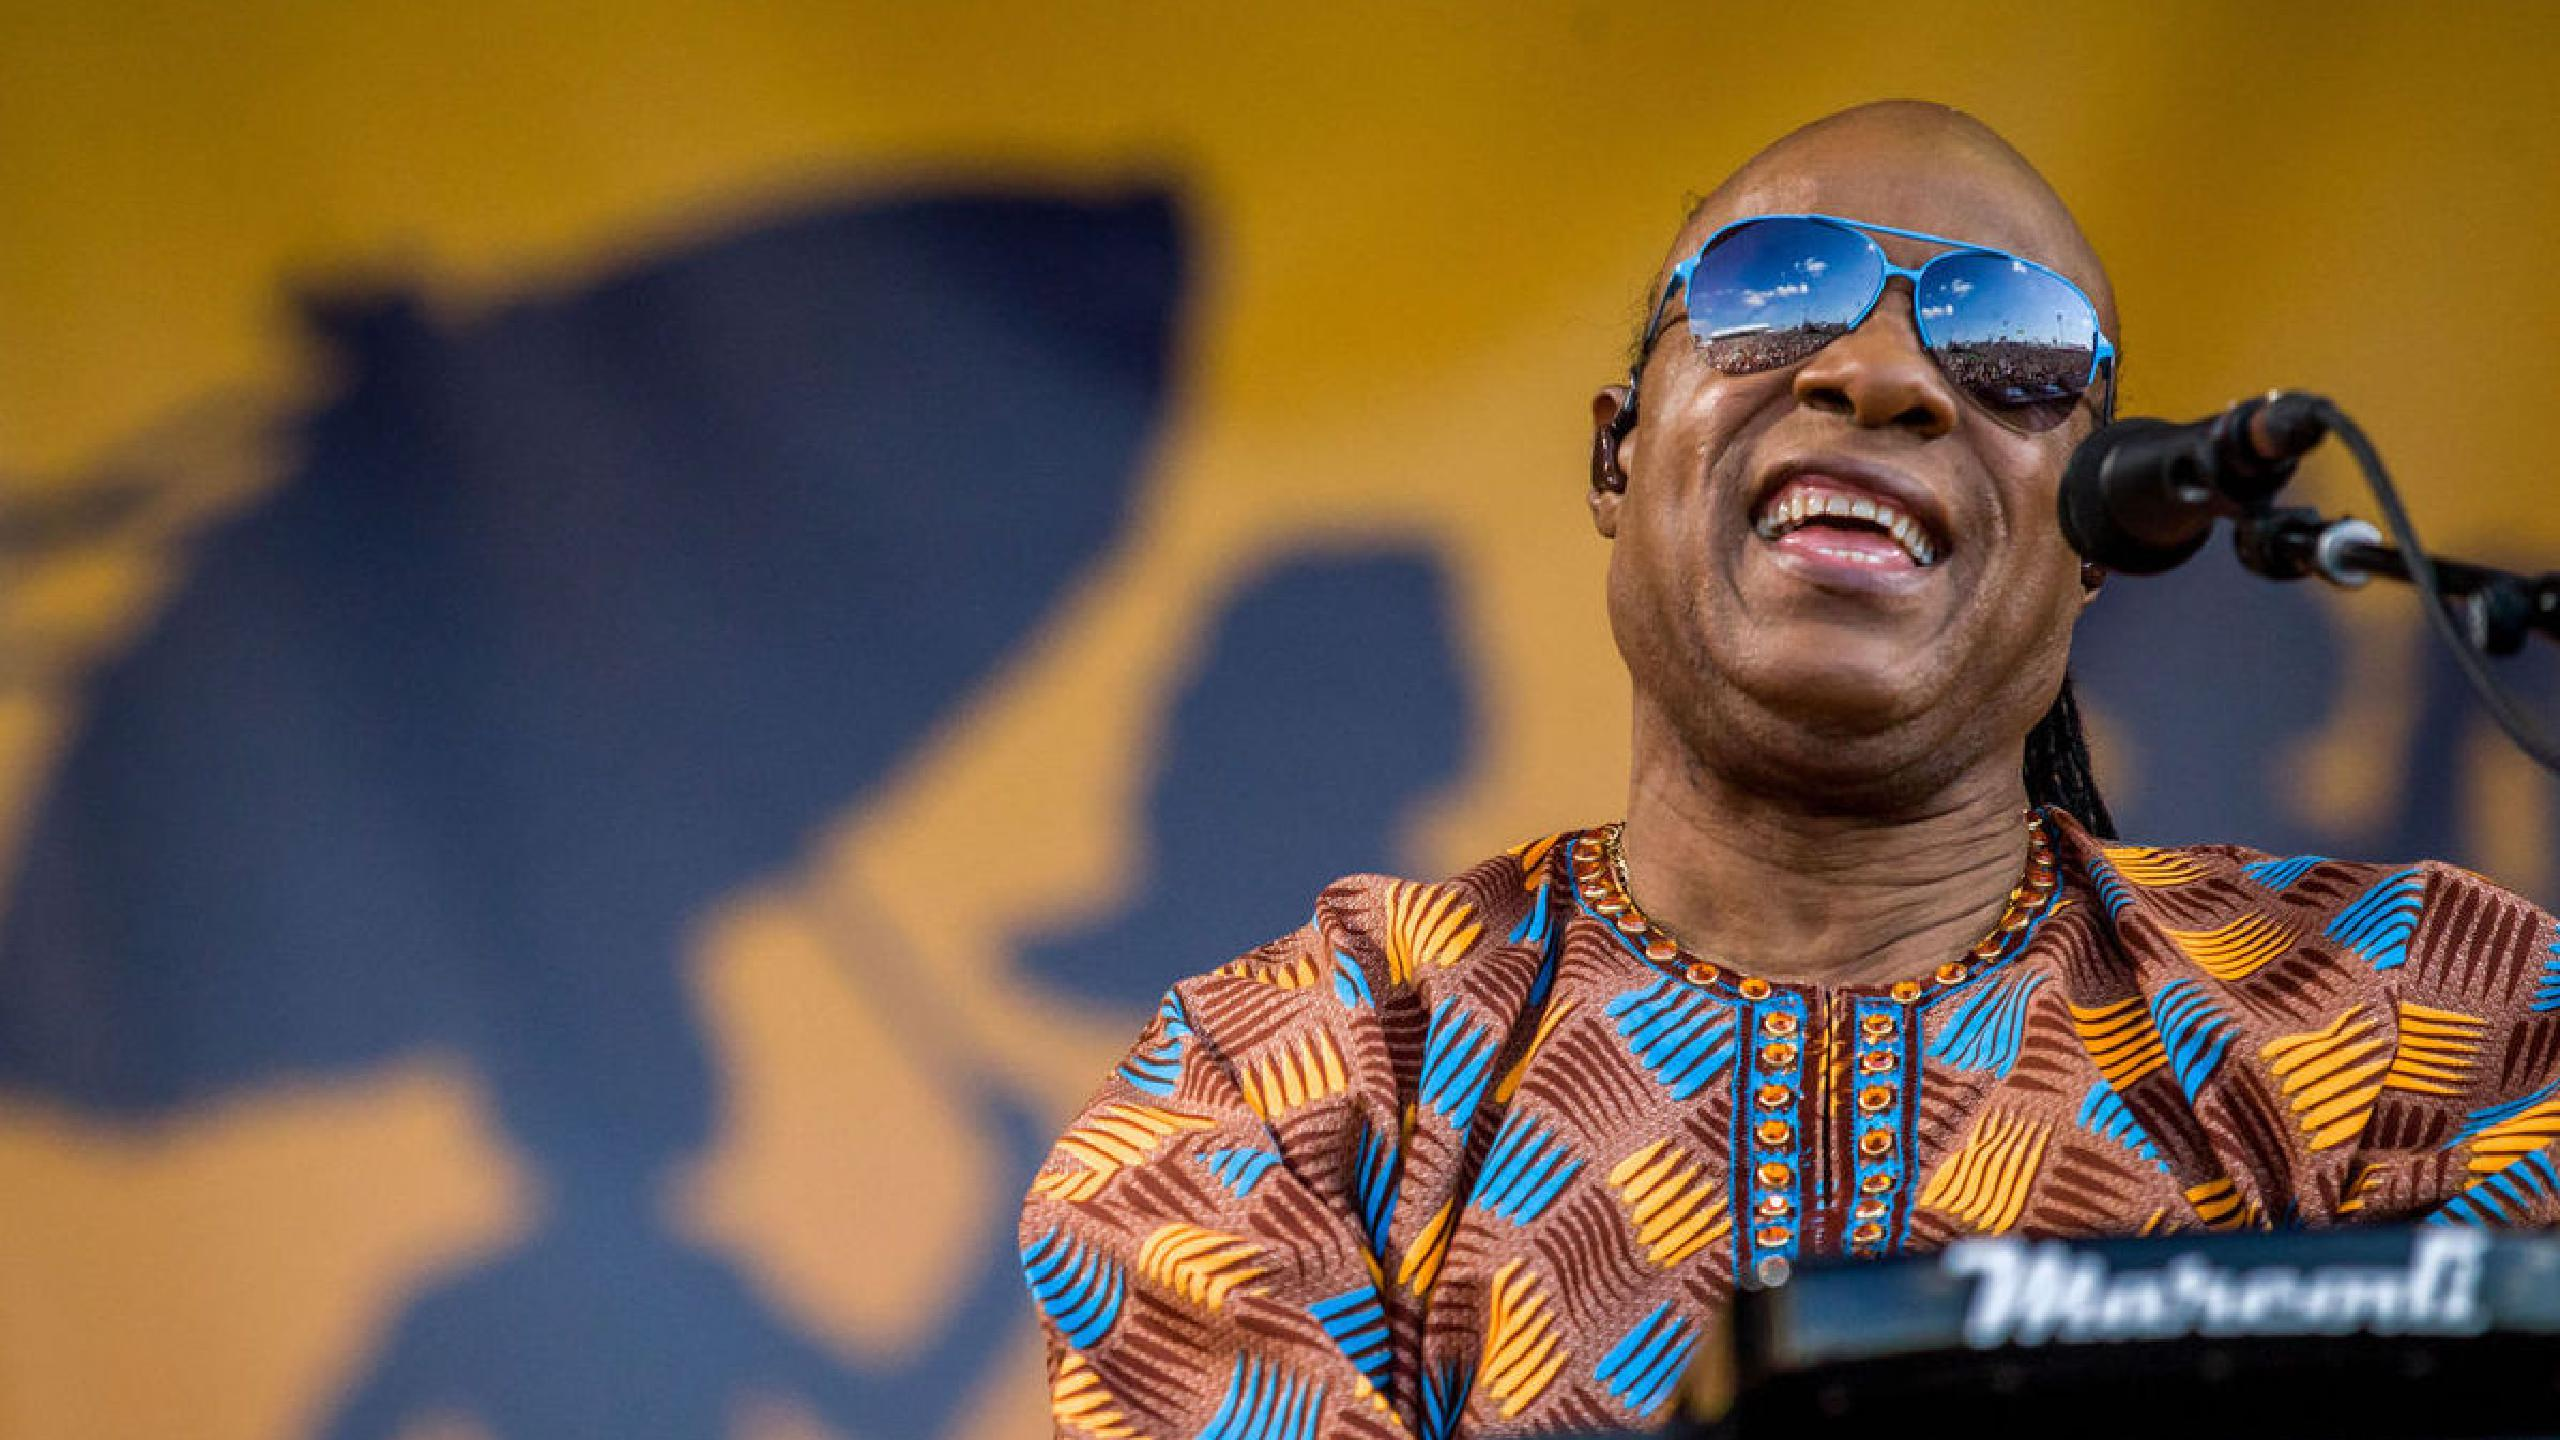 Stevie Wonder Christmas Concert 2020 Stevie Wonder tour dates 2020 2021. Stevie Wonder tickets and